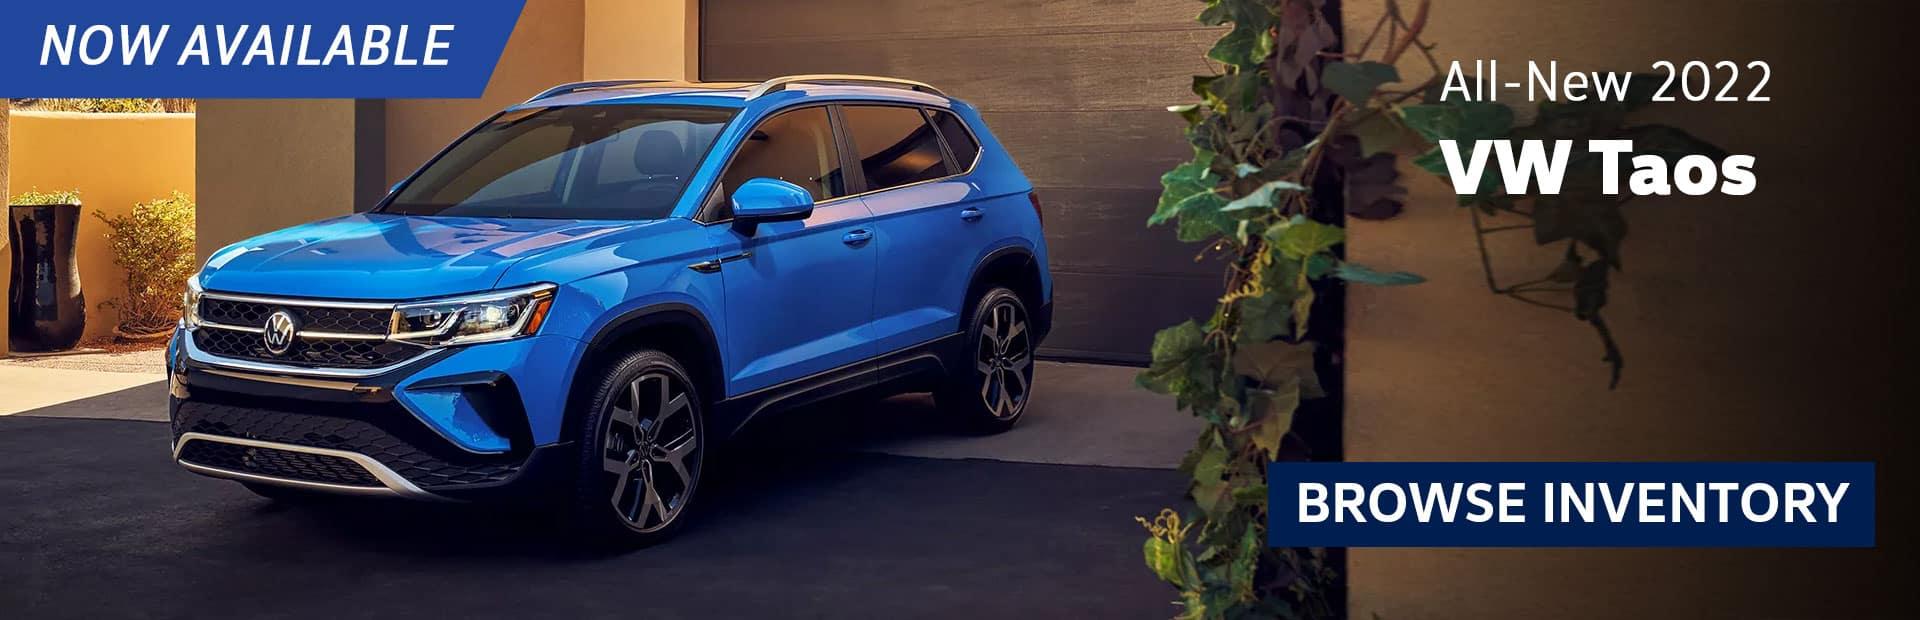 New 2022 Volkswagen Taos For Sale in Glendale california los angeles